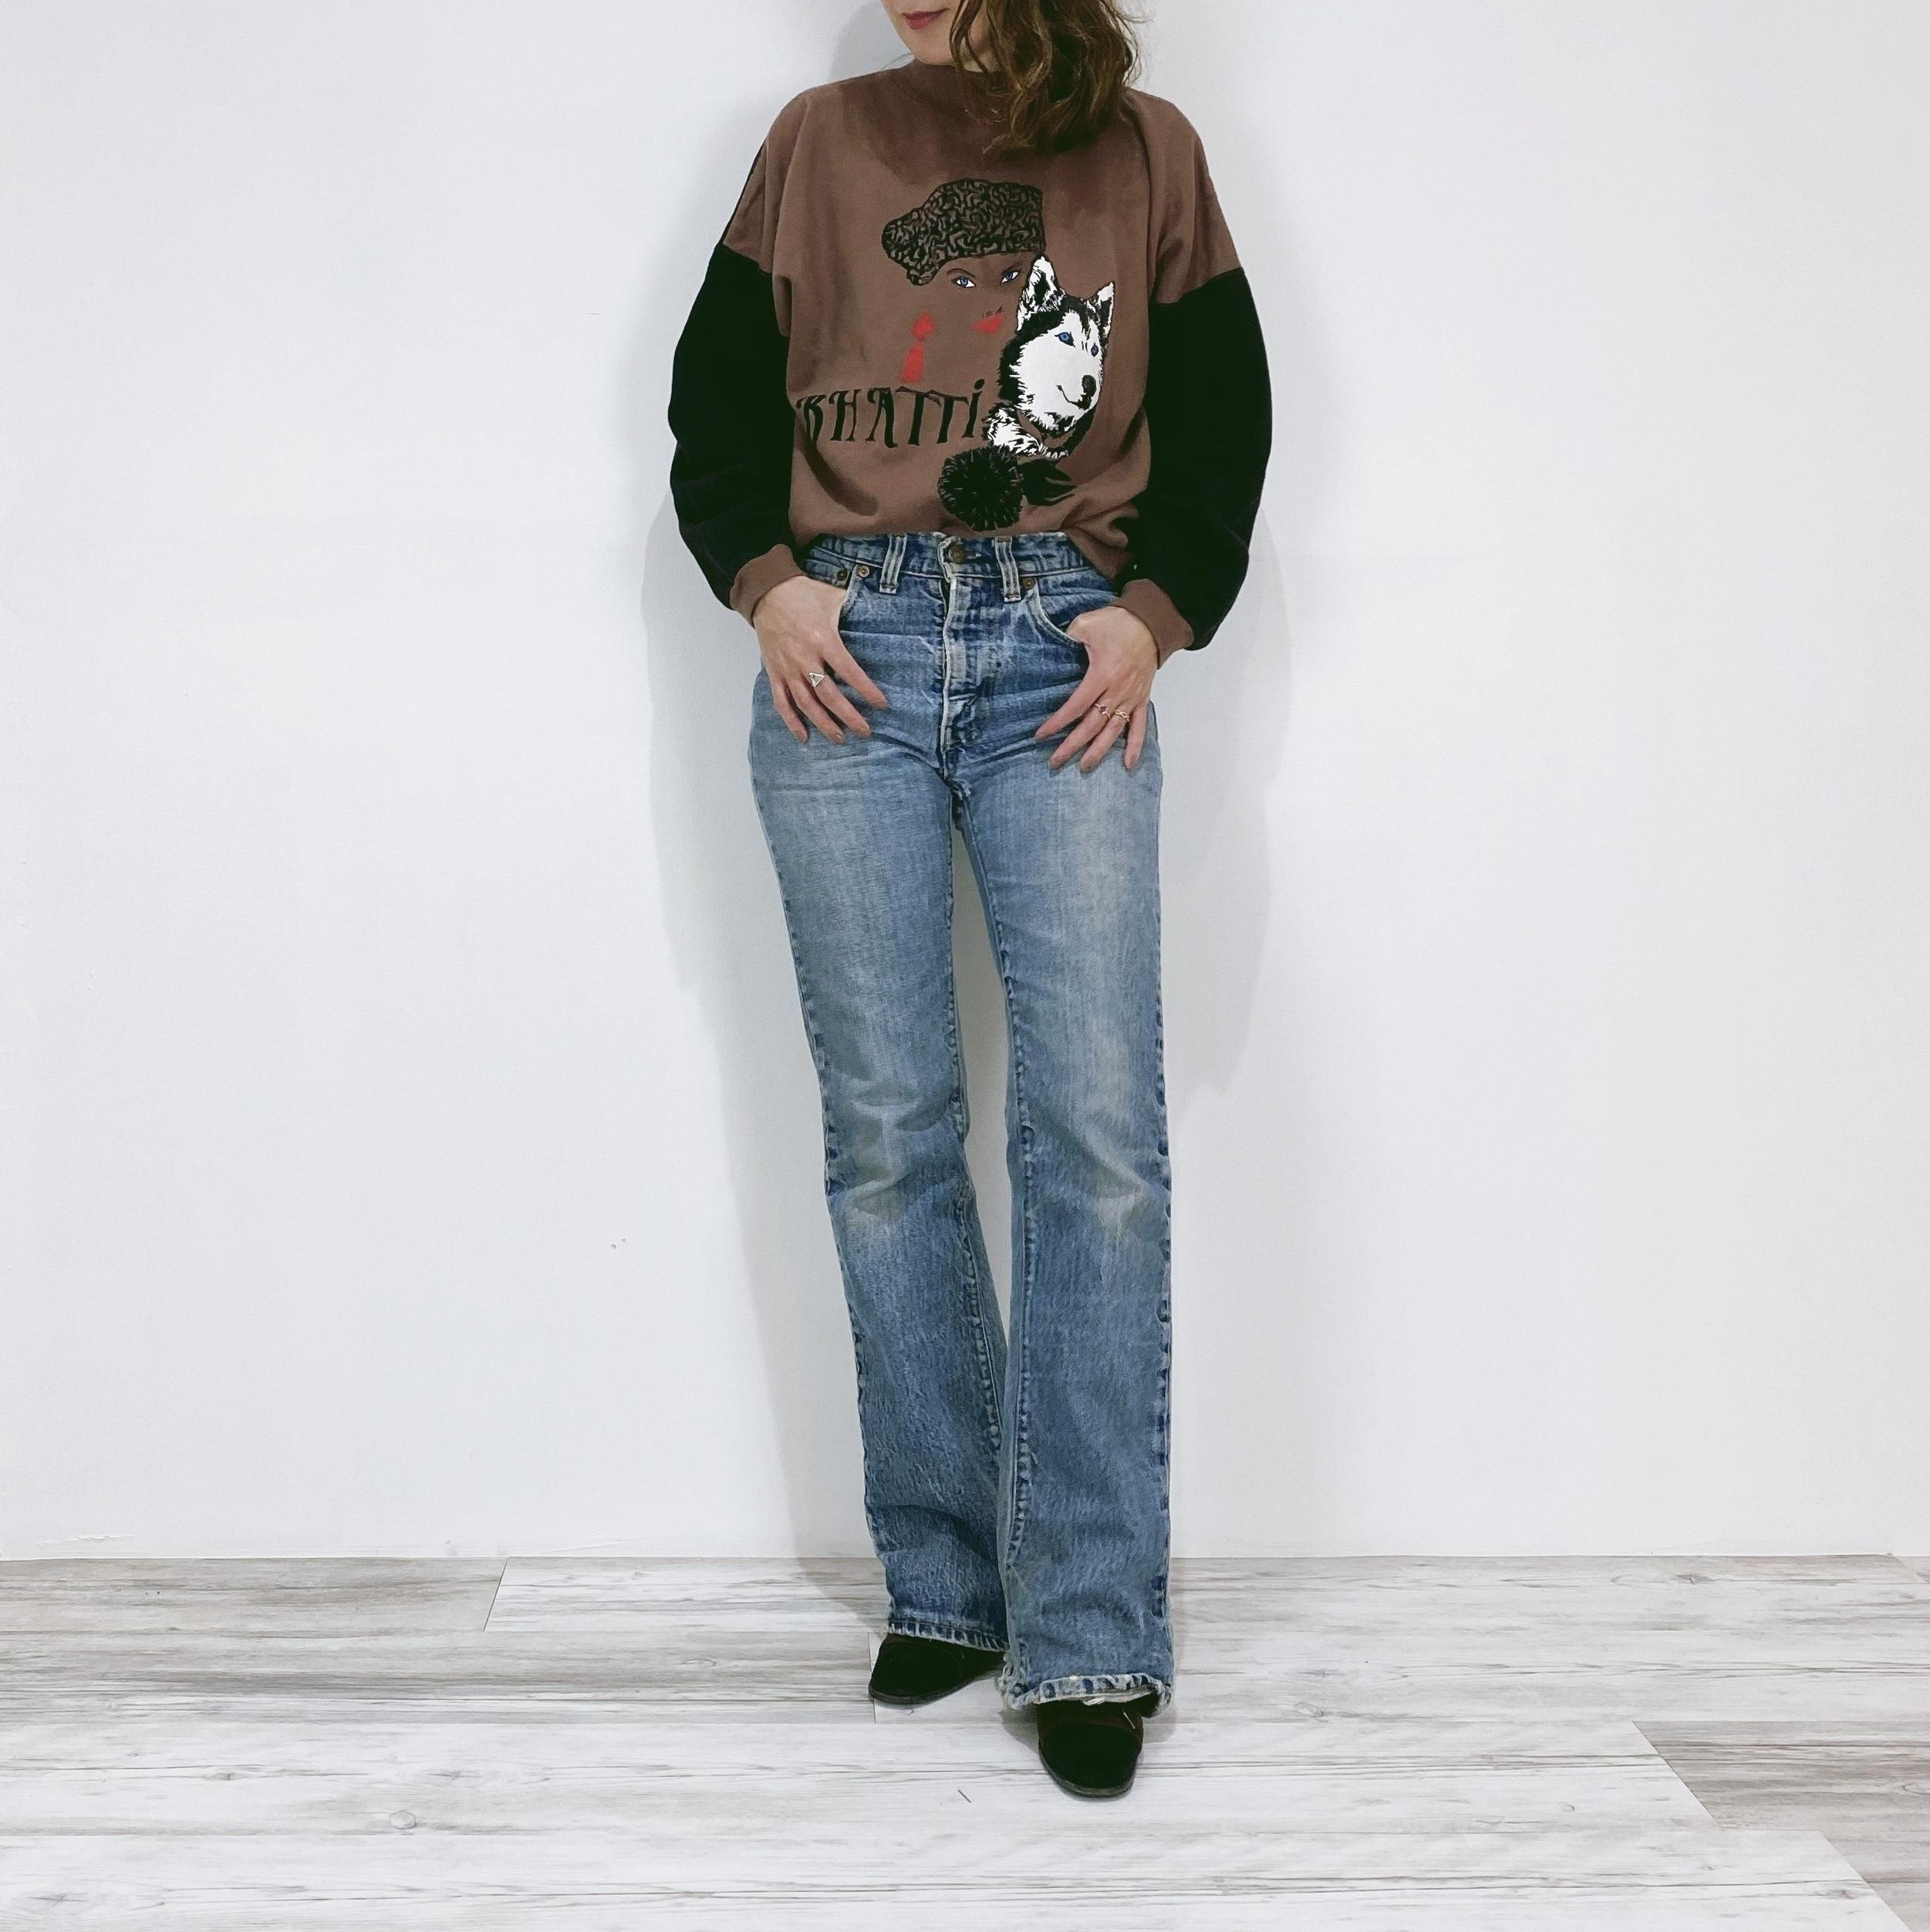 ◼︎80s vintage woman & dog sweatshirt from U.S.A.◼︎